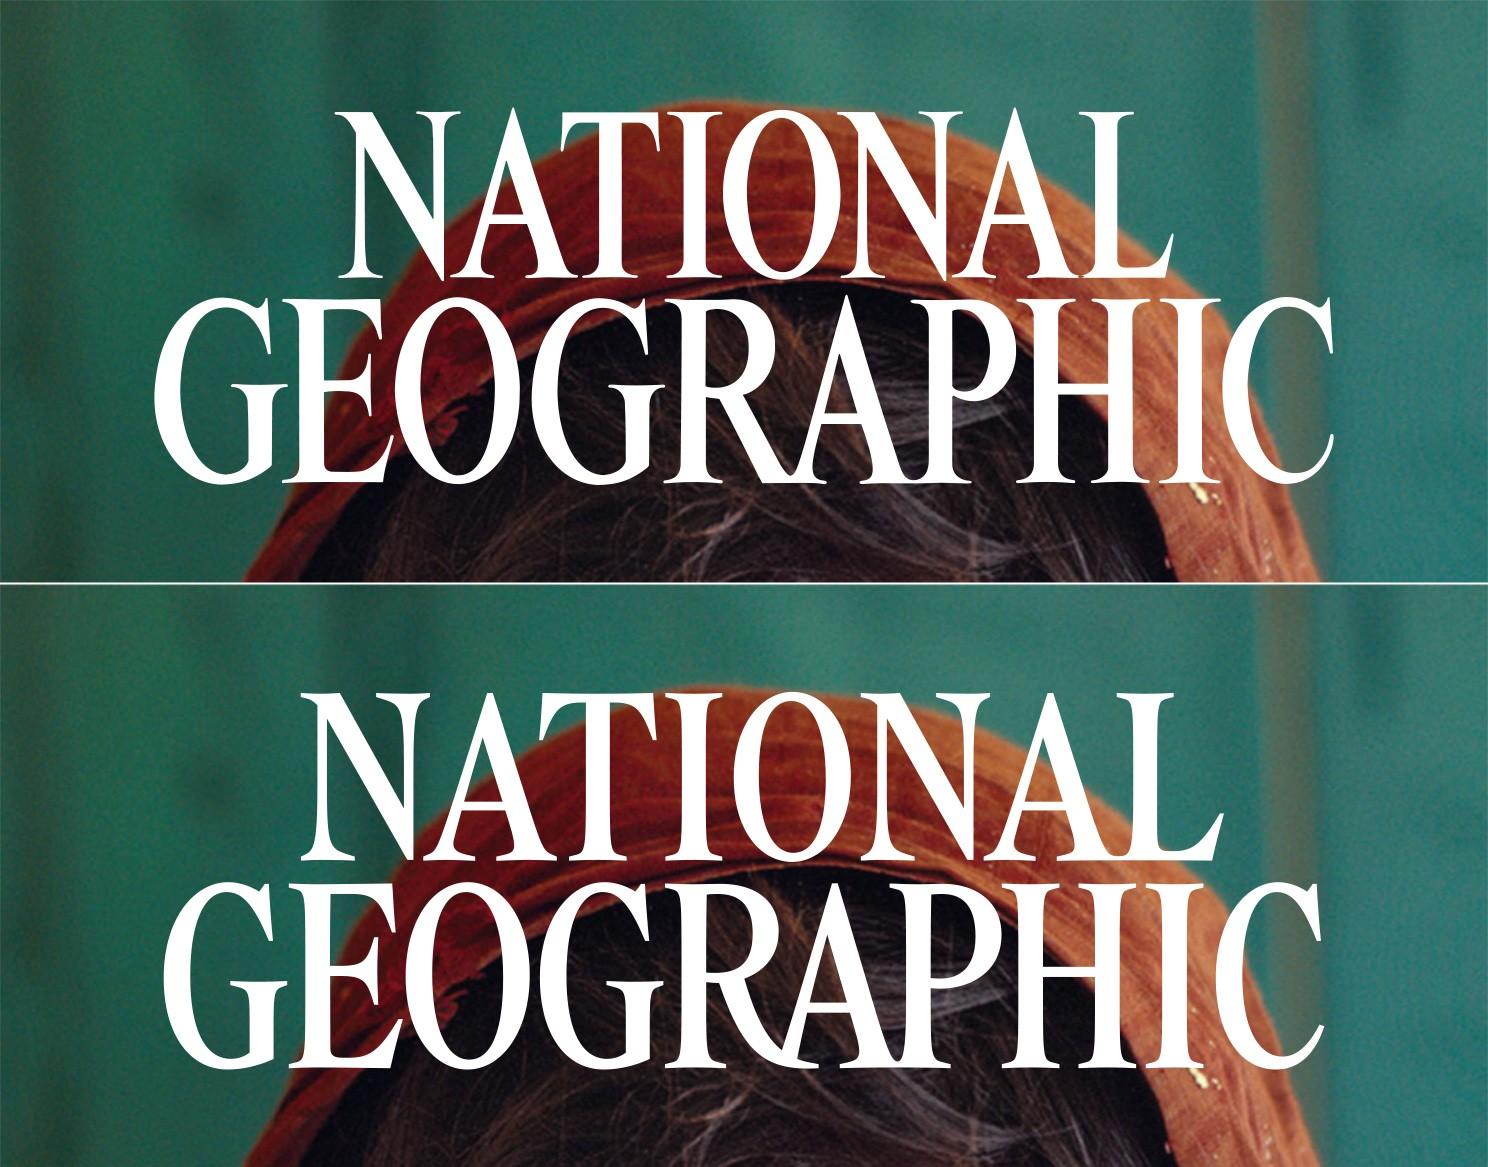 nat-geo-logo-photo-comparison.jpg